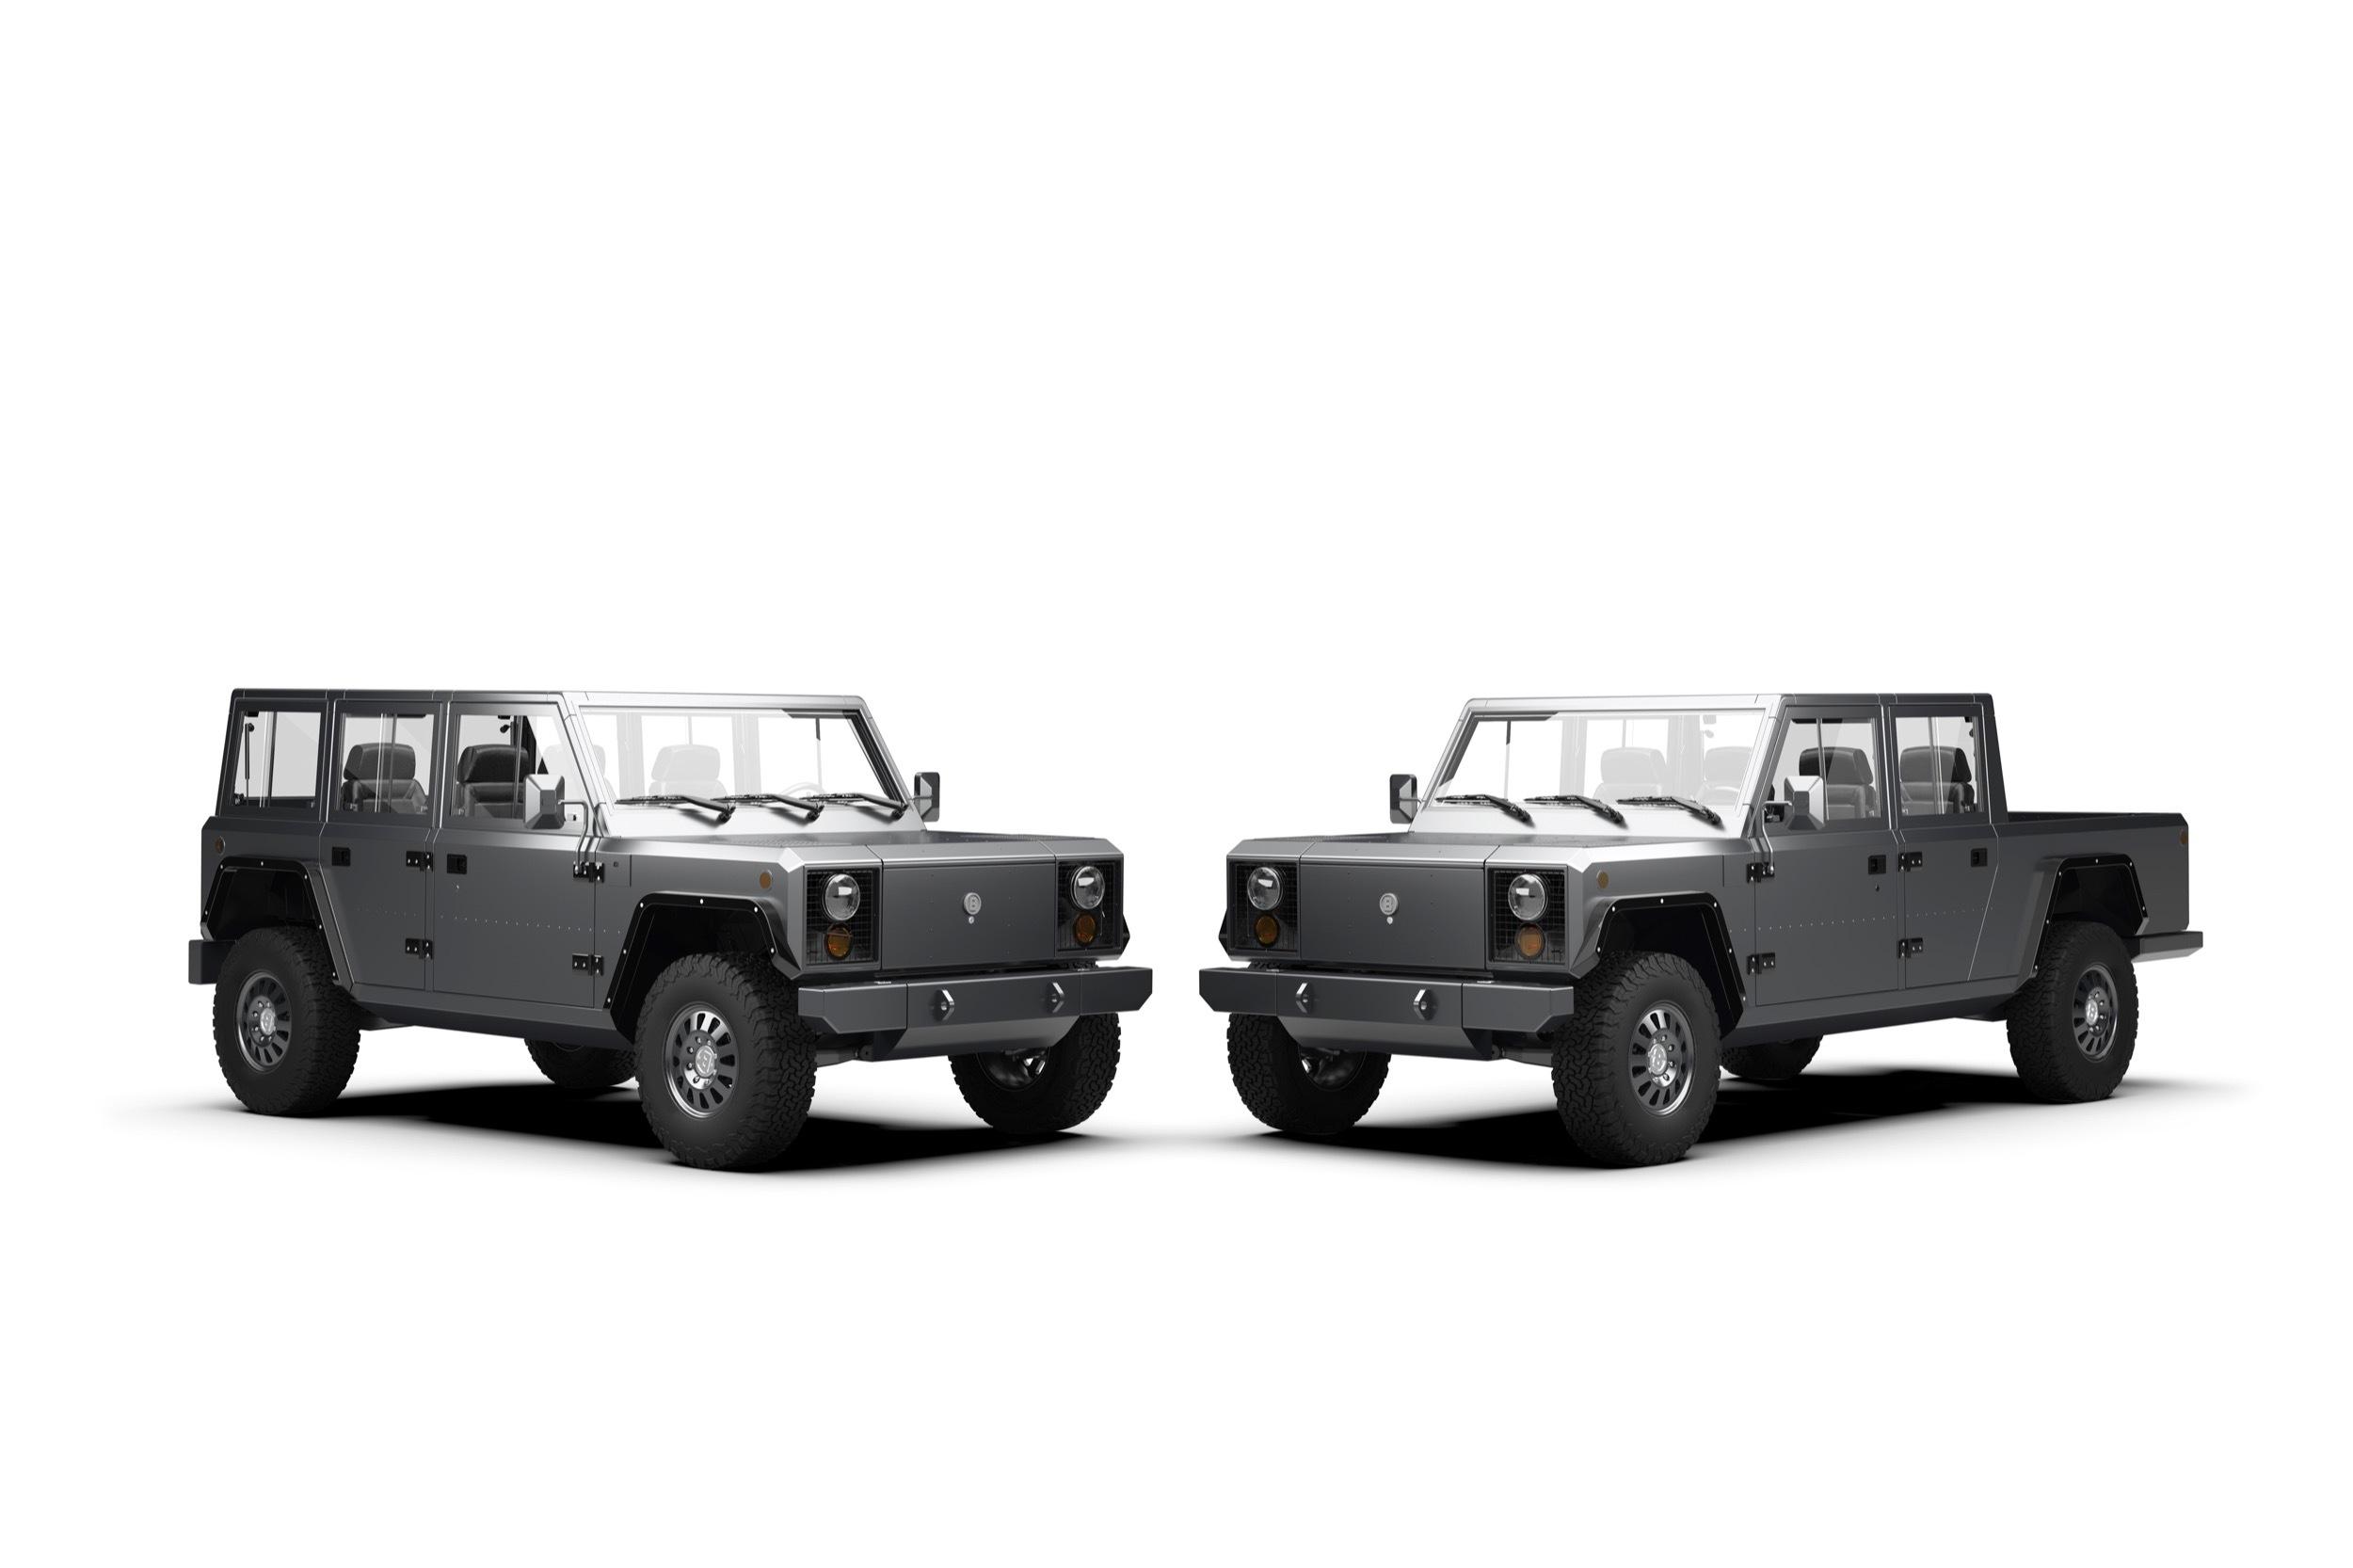 bollinger-motors-b1-b2-01-1